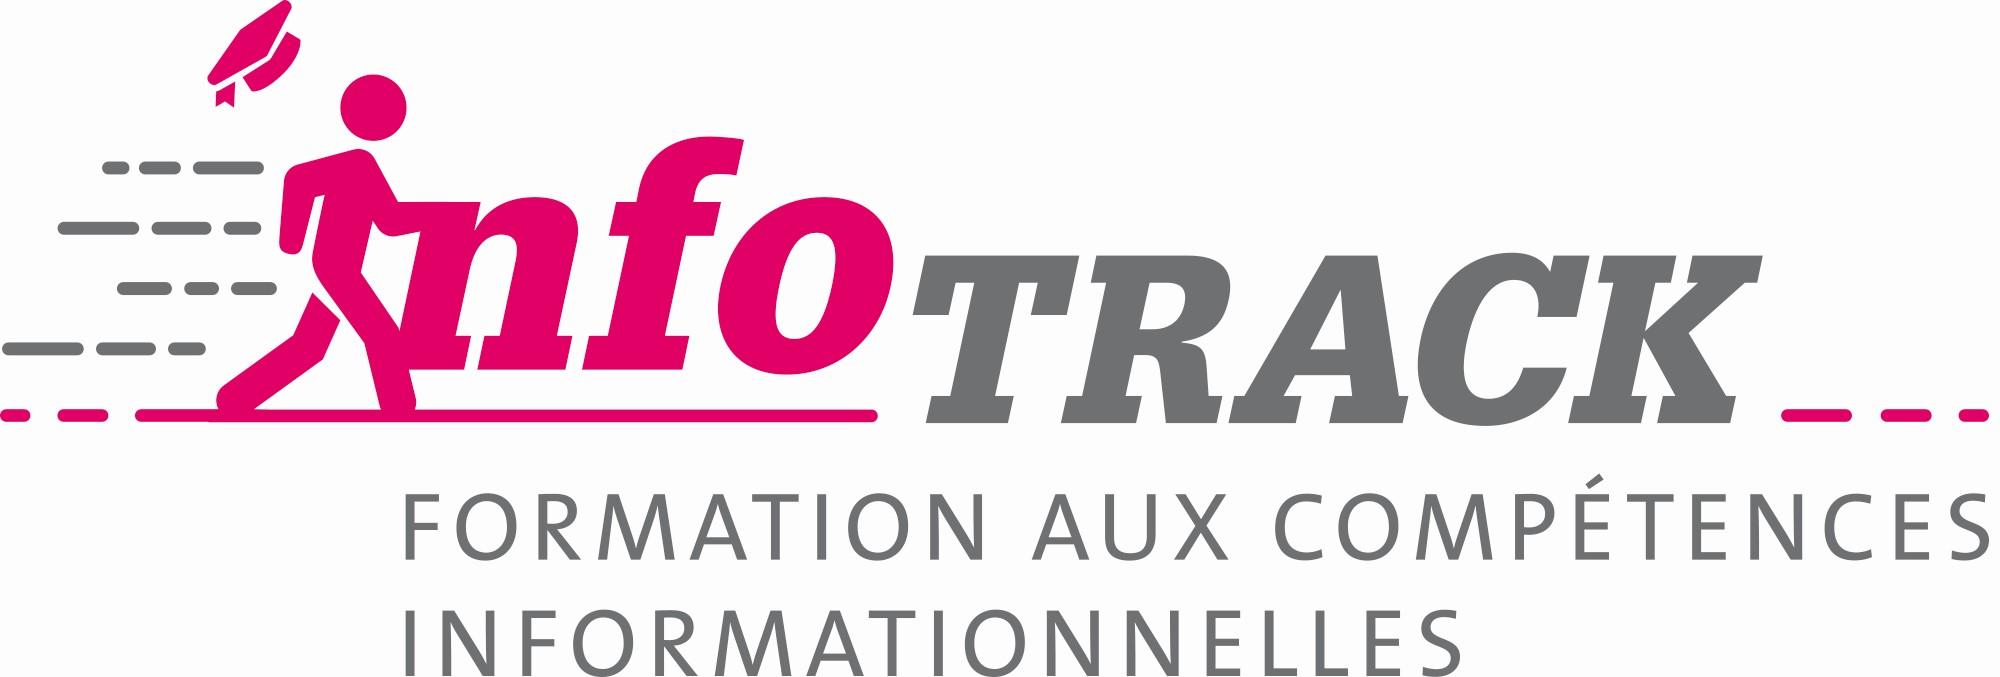 logo infotrack.jpg